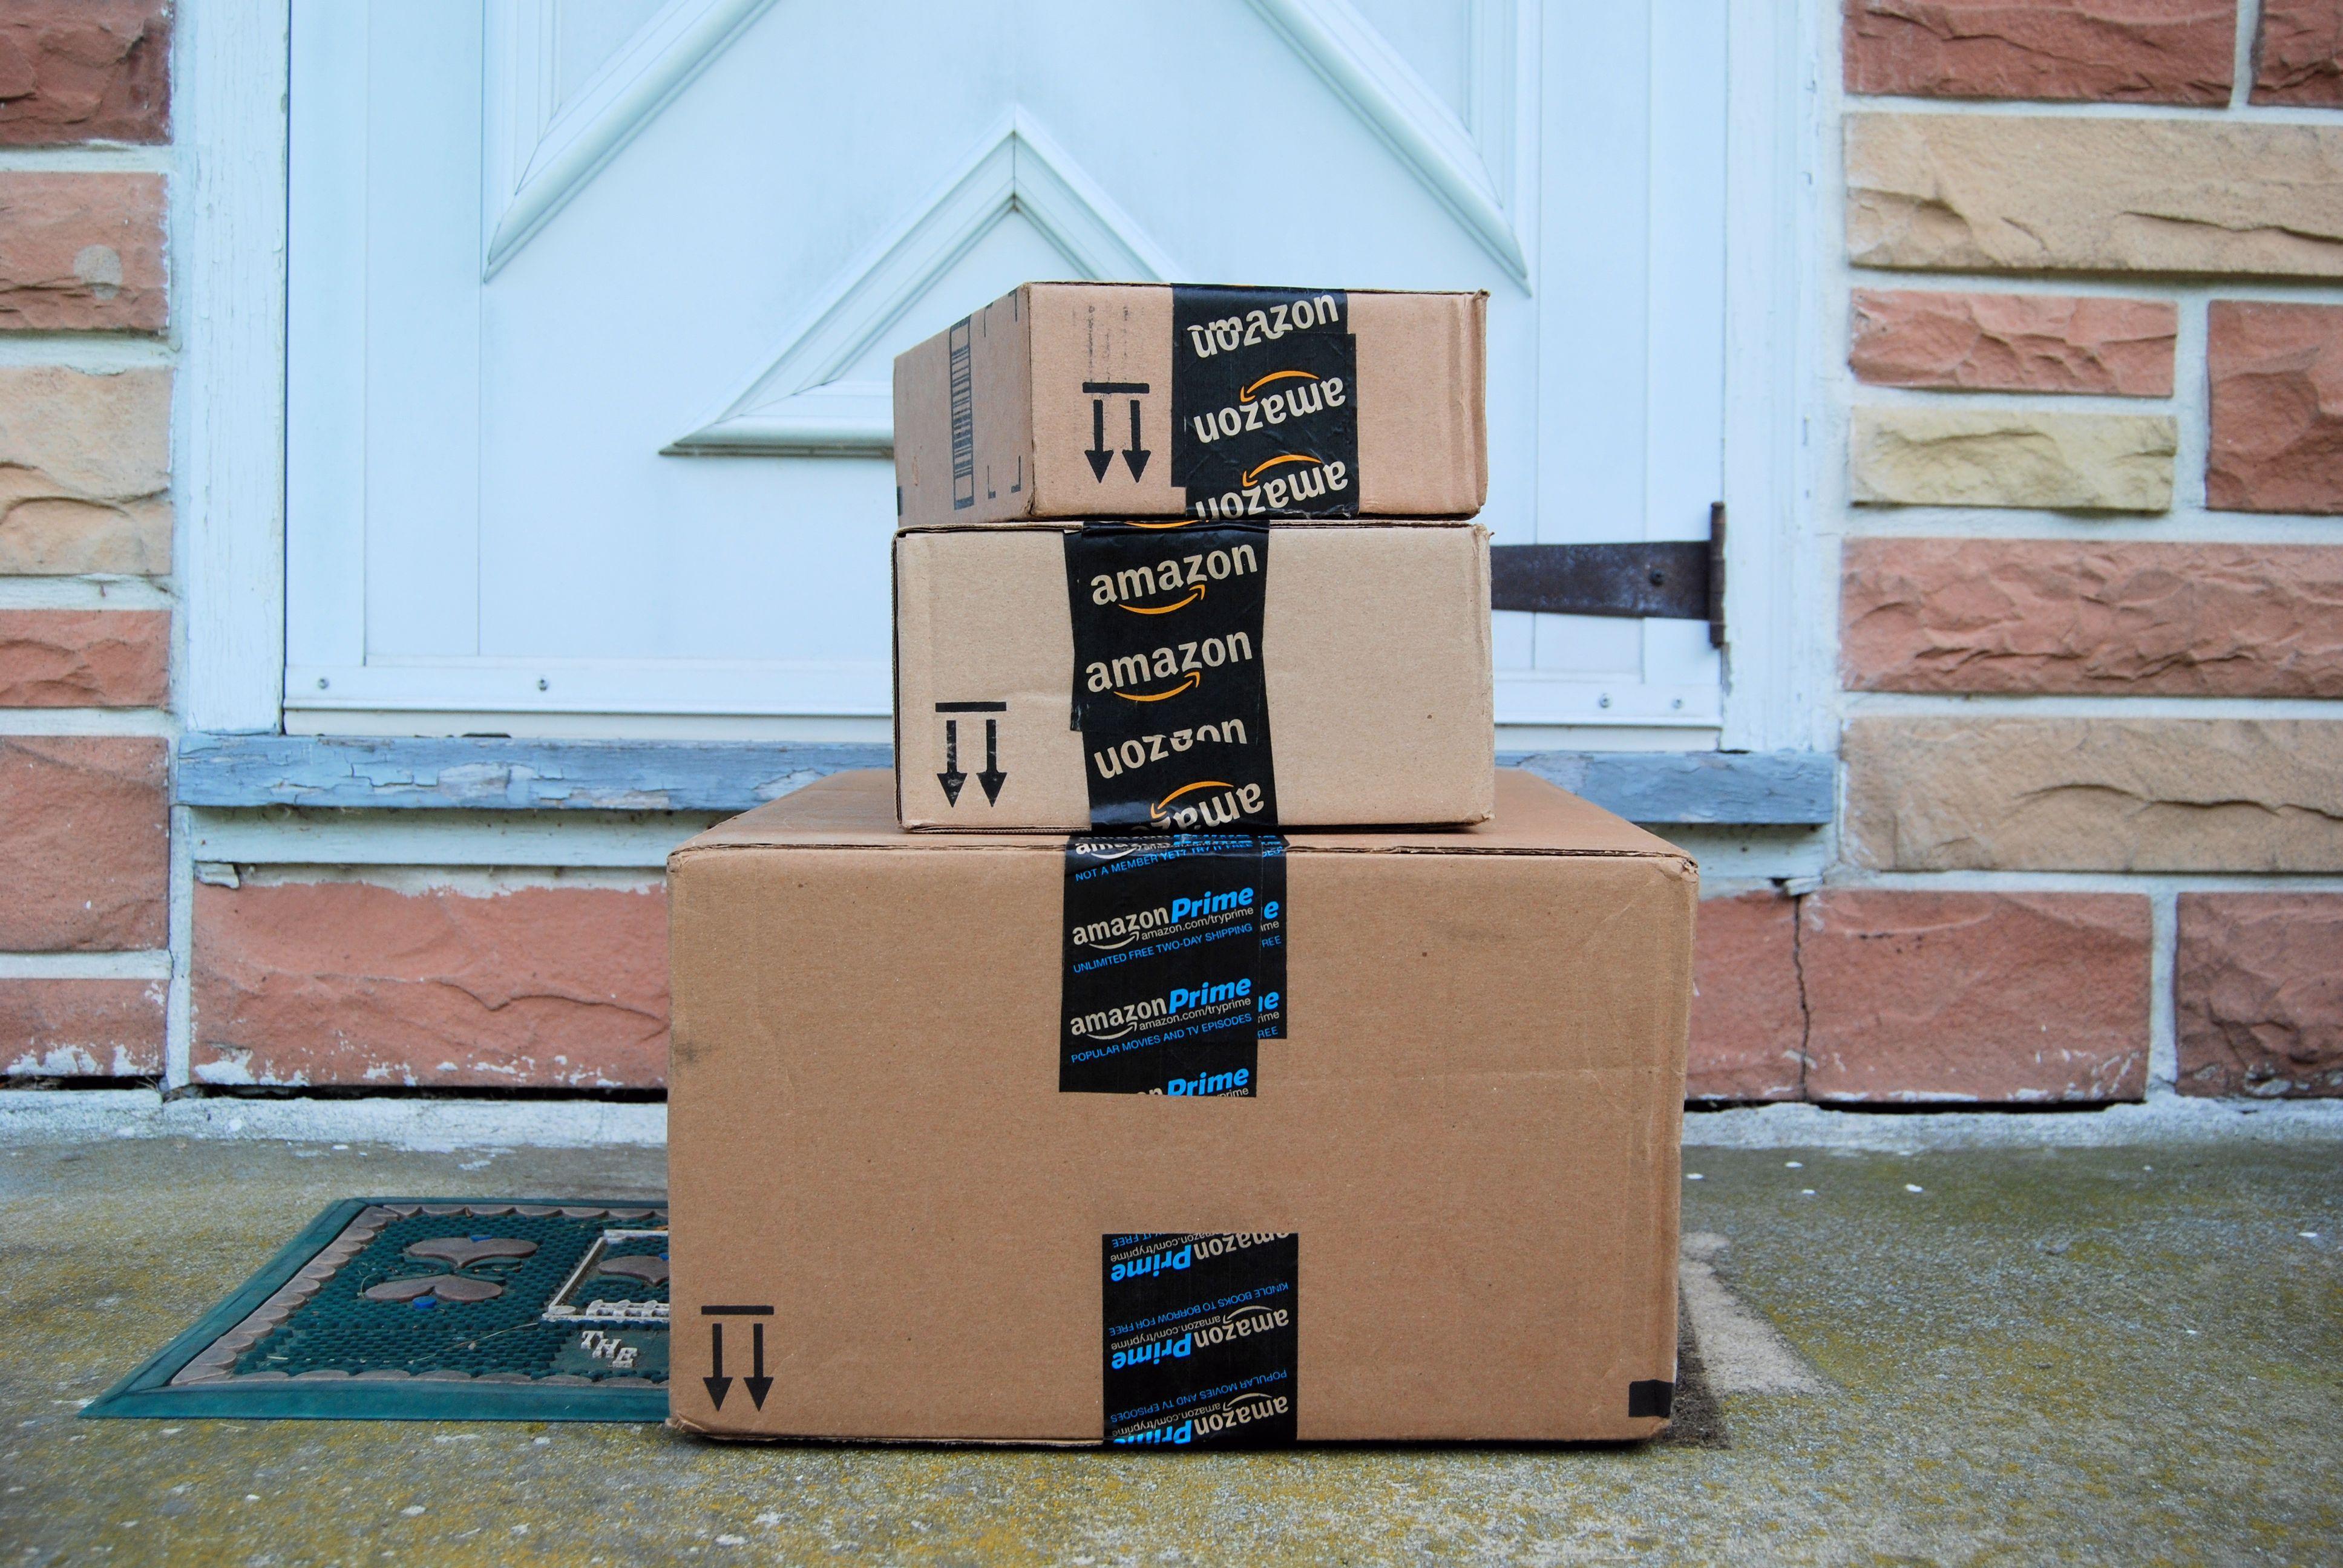 Free Food & Supplies on Amazon.com